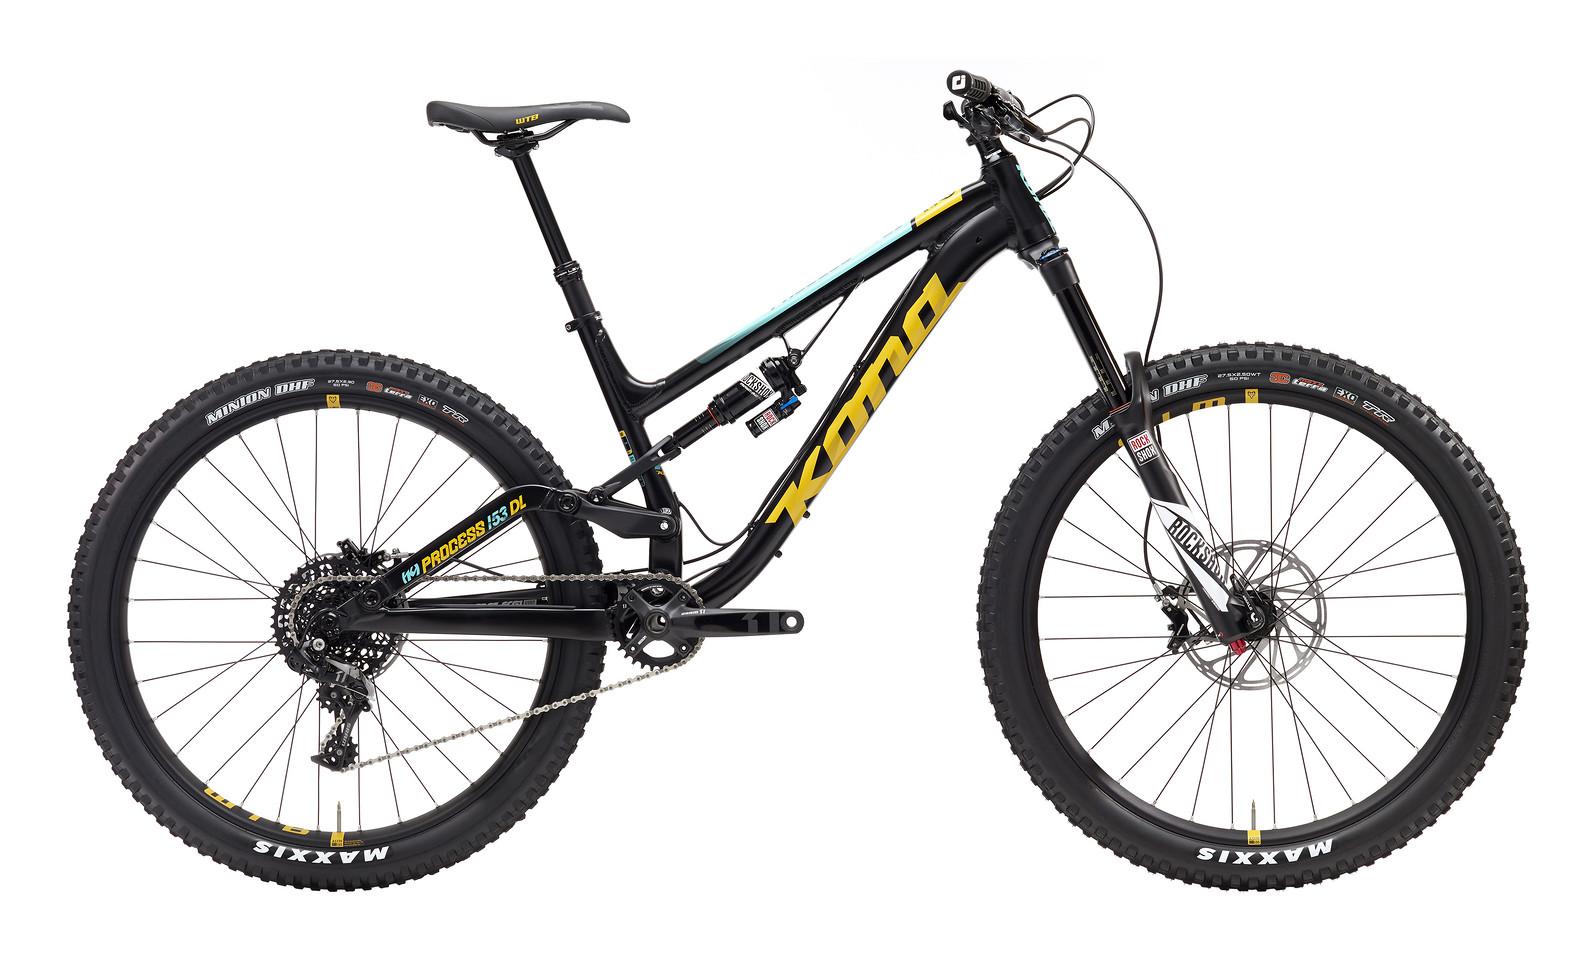 2017 Kona Process 153 DL Bike